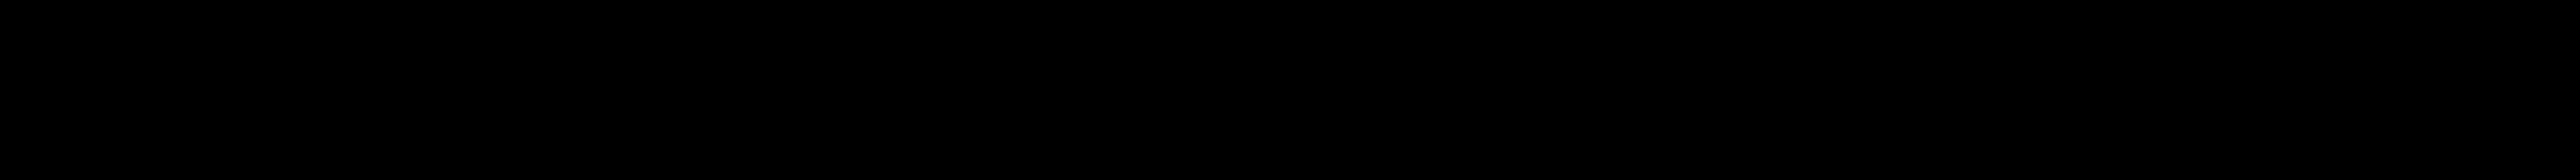 Garfield Fonts Fontspace